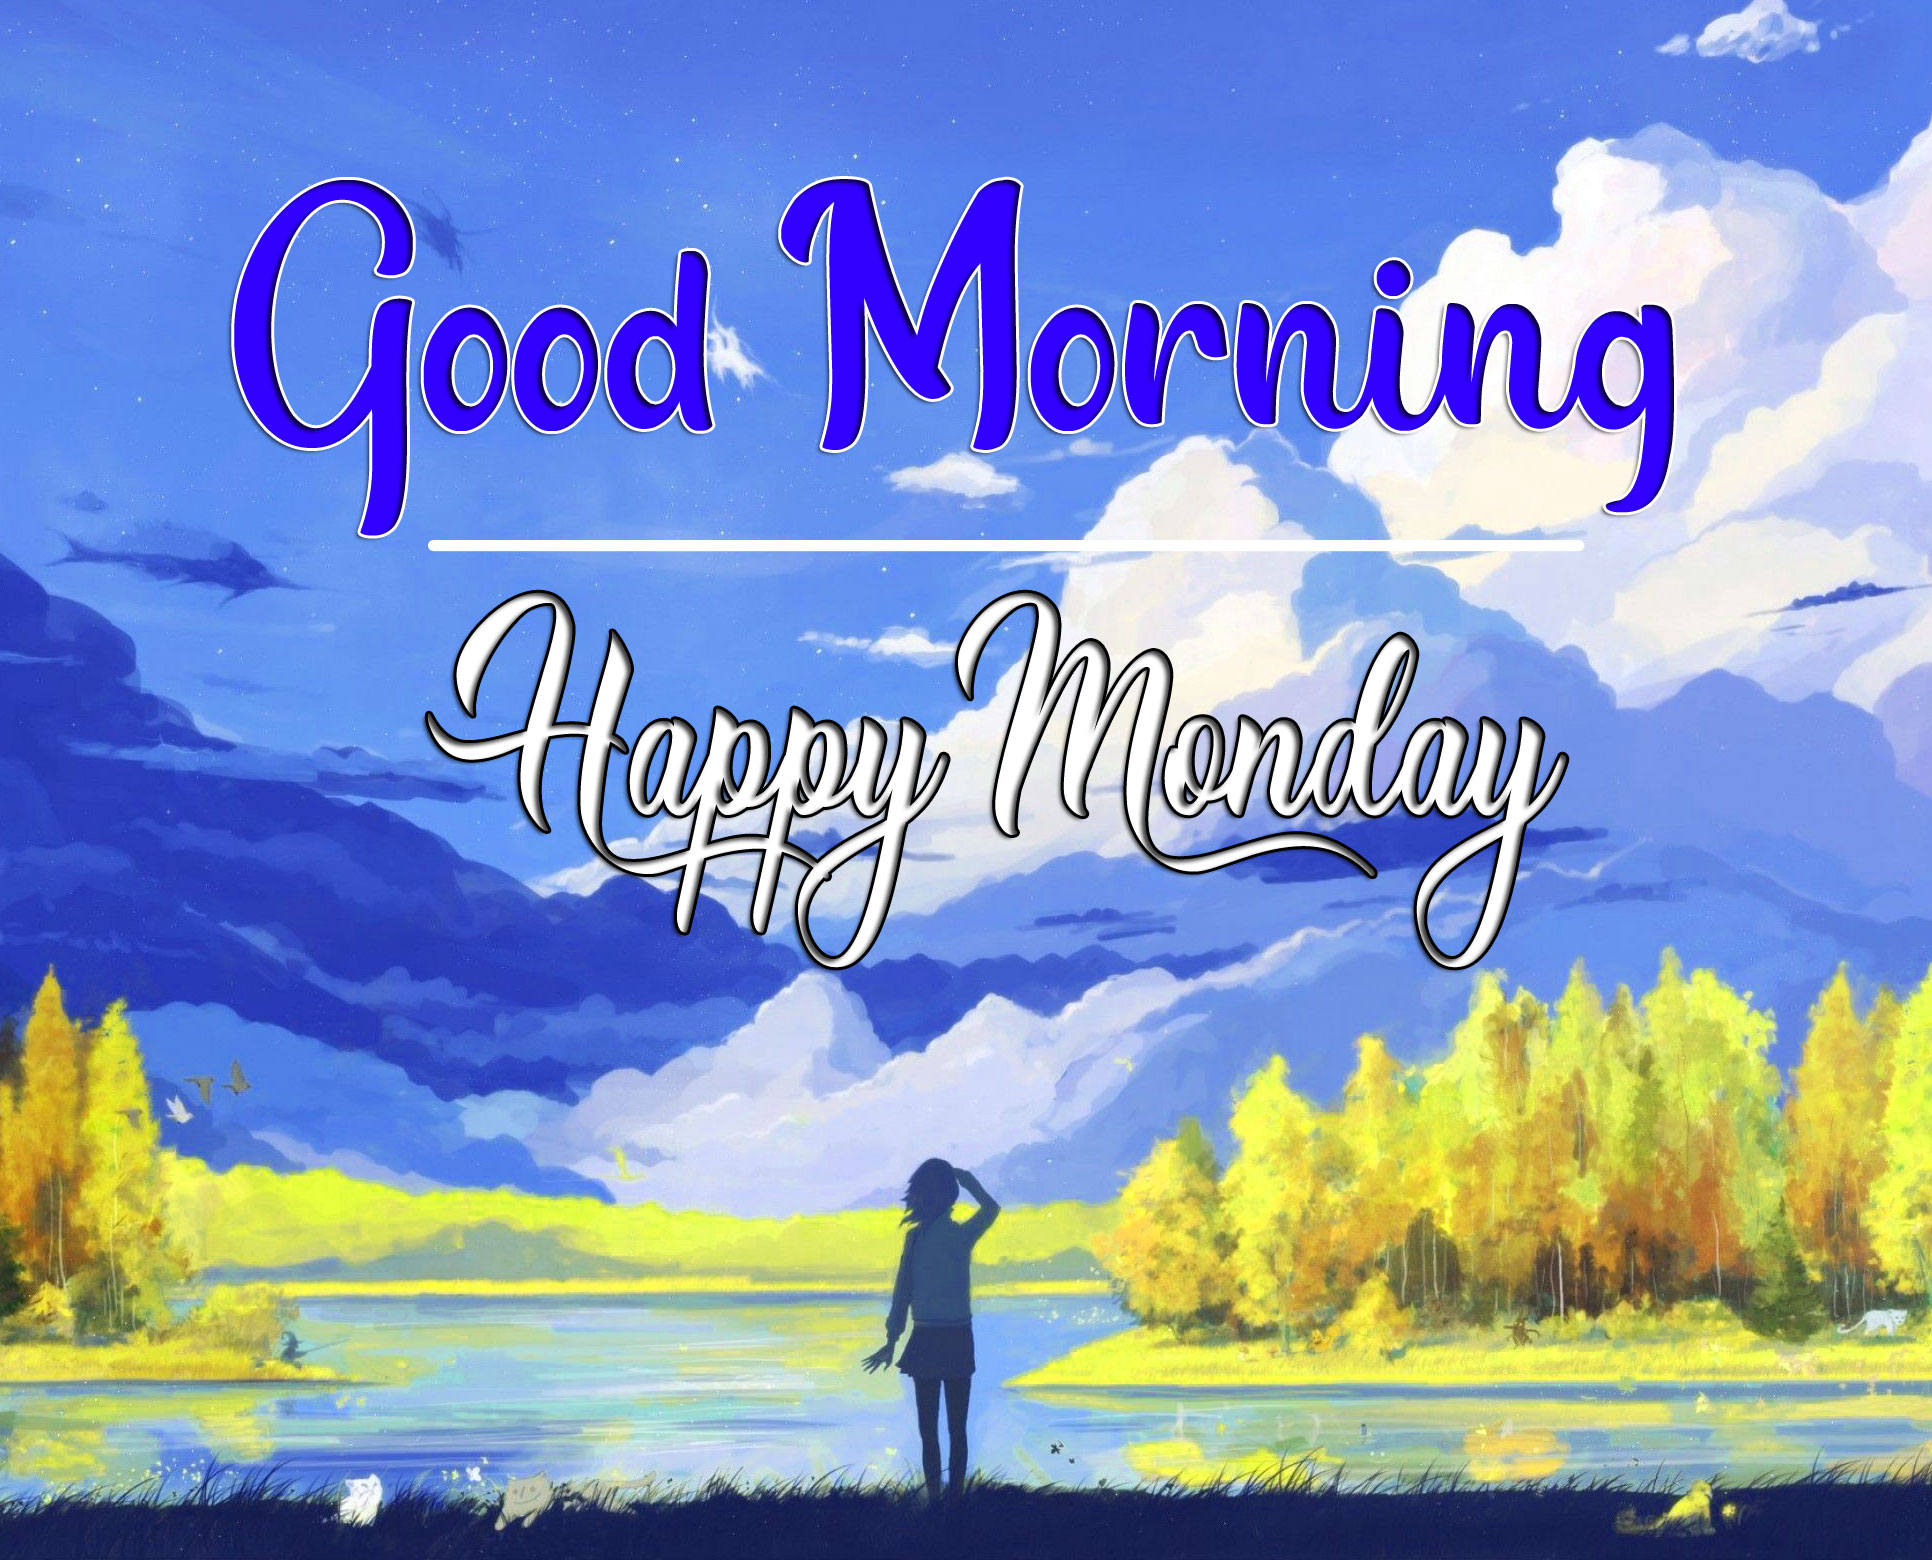 Monday Good Morning Pics Images 1